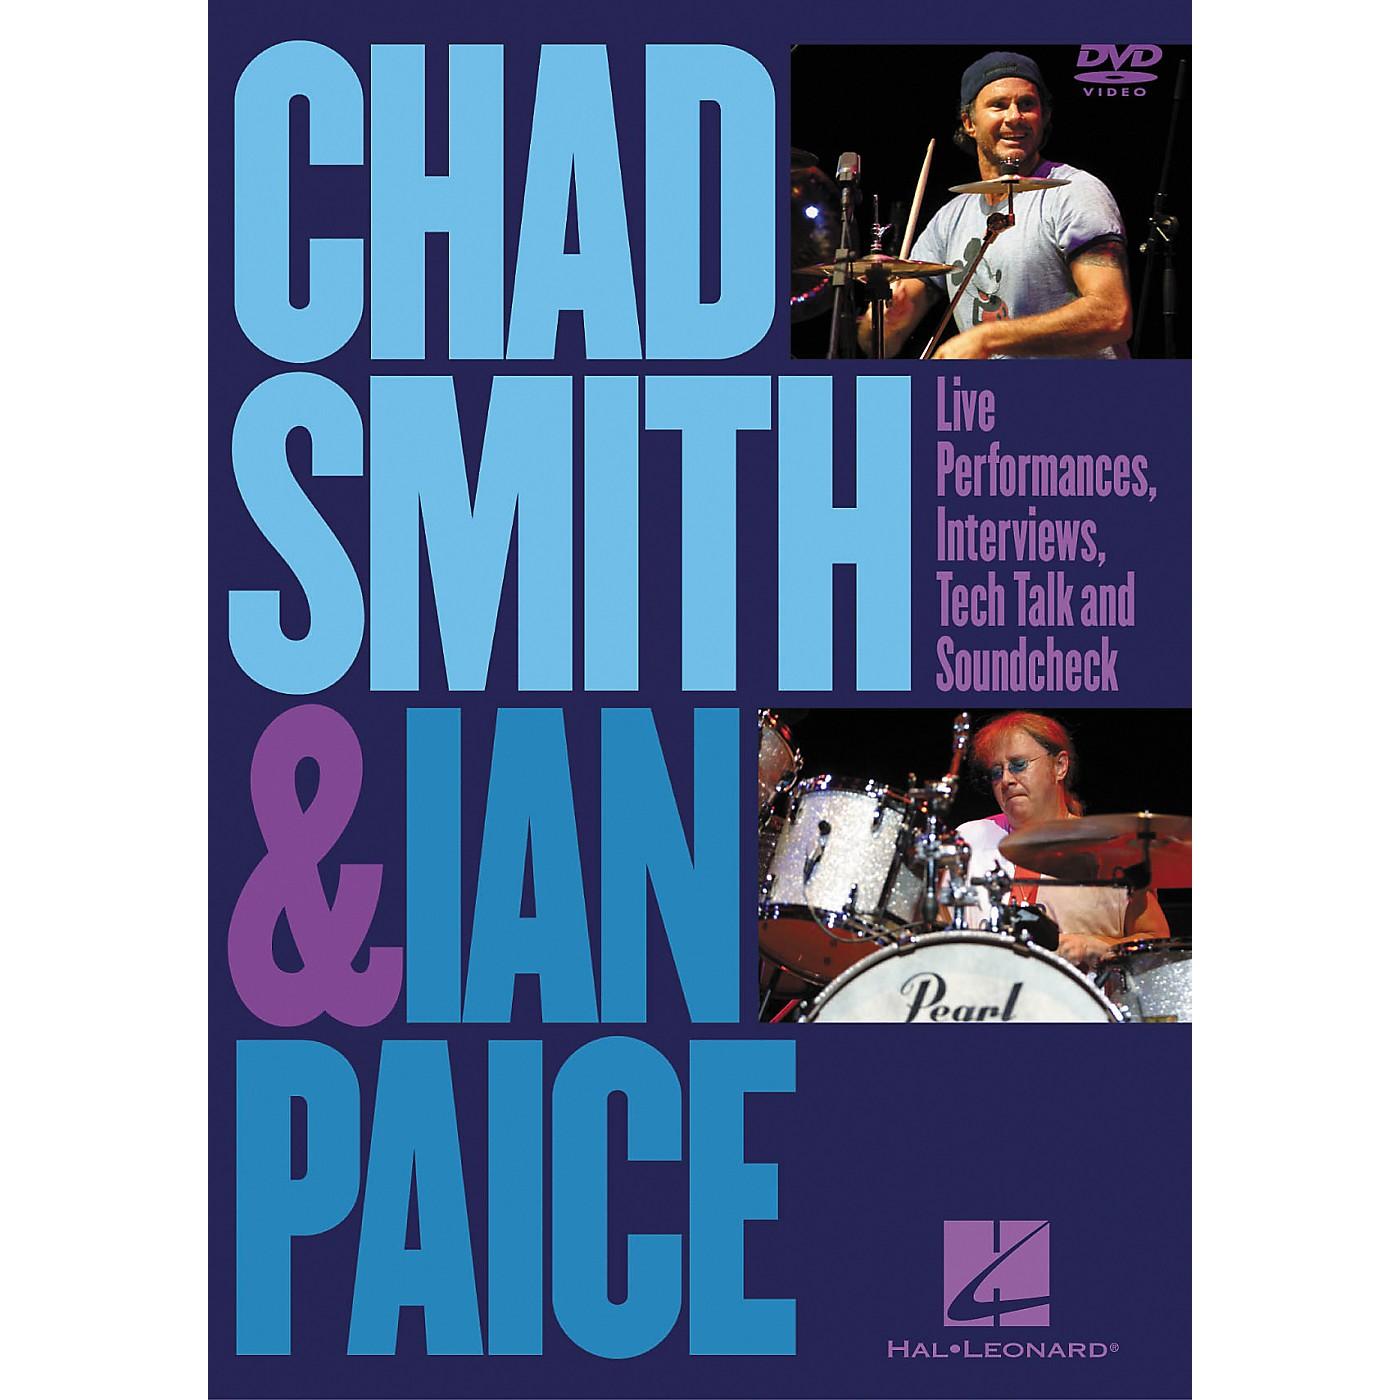 Hal Leonard Chad Smith and Ian Paice (DVD) thumbnail